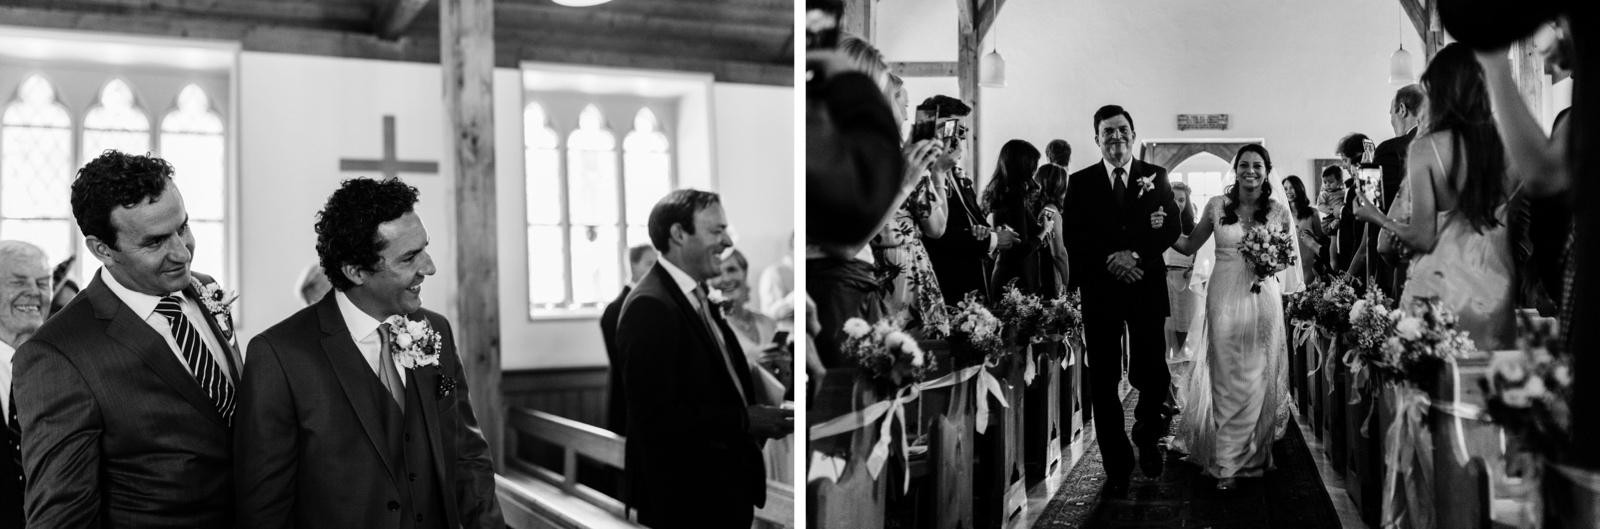 Fotomagoria Best 0f 2018 Wedding Photographer Italy81.jpg